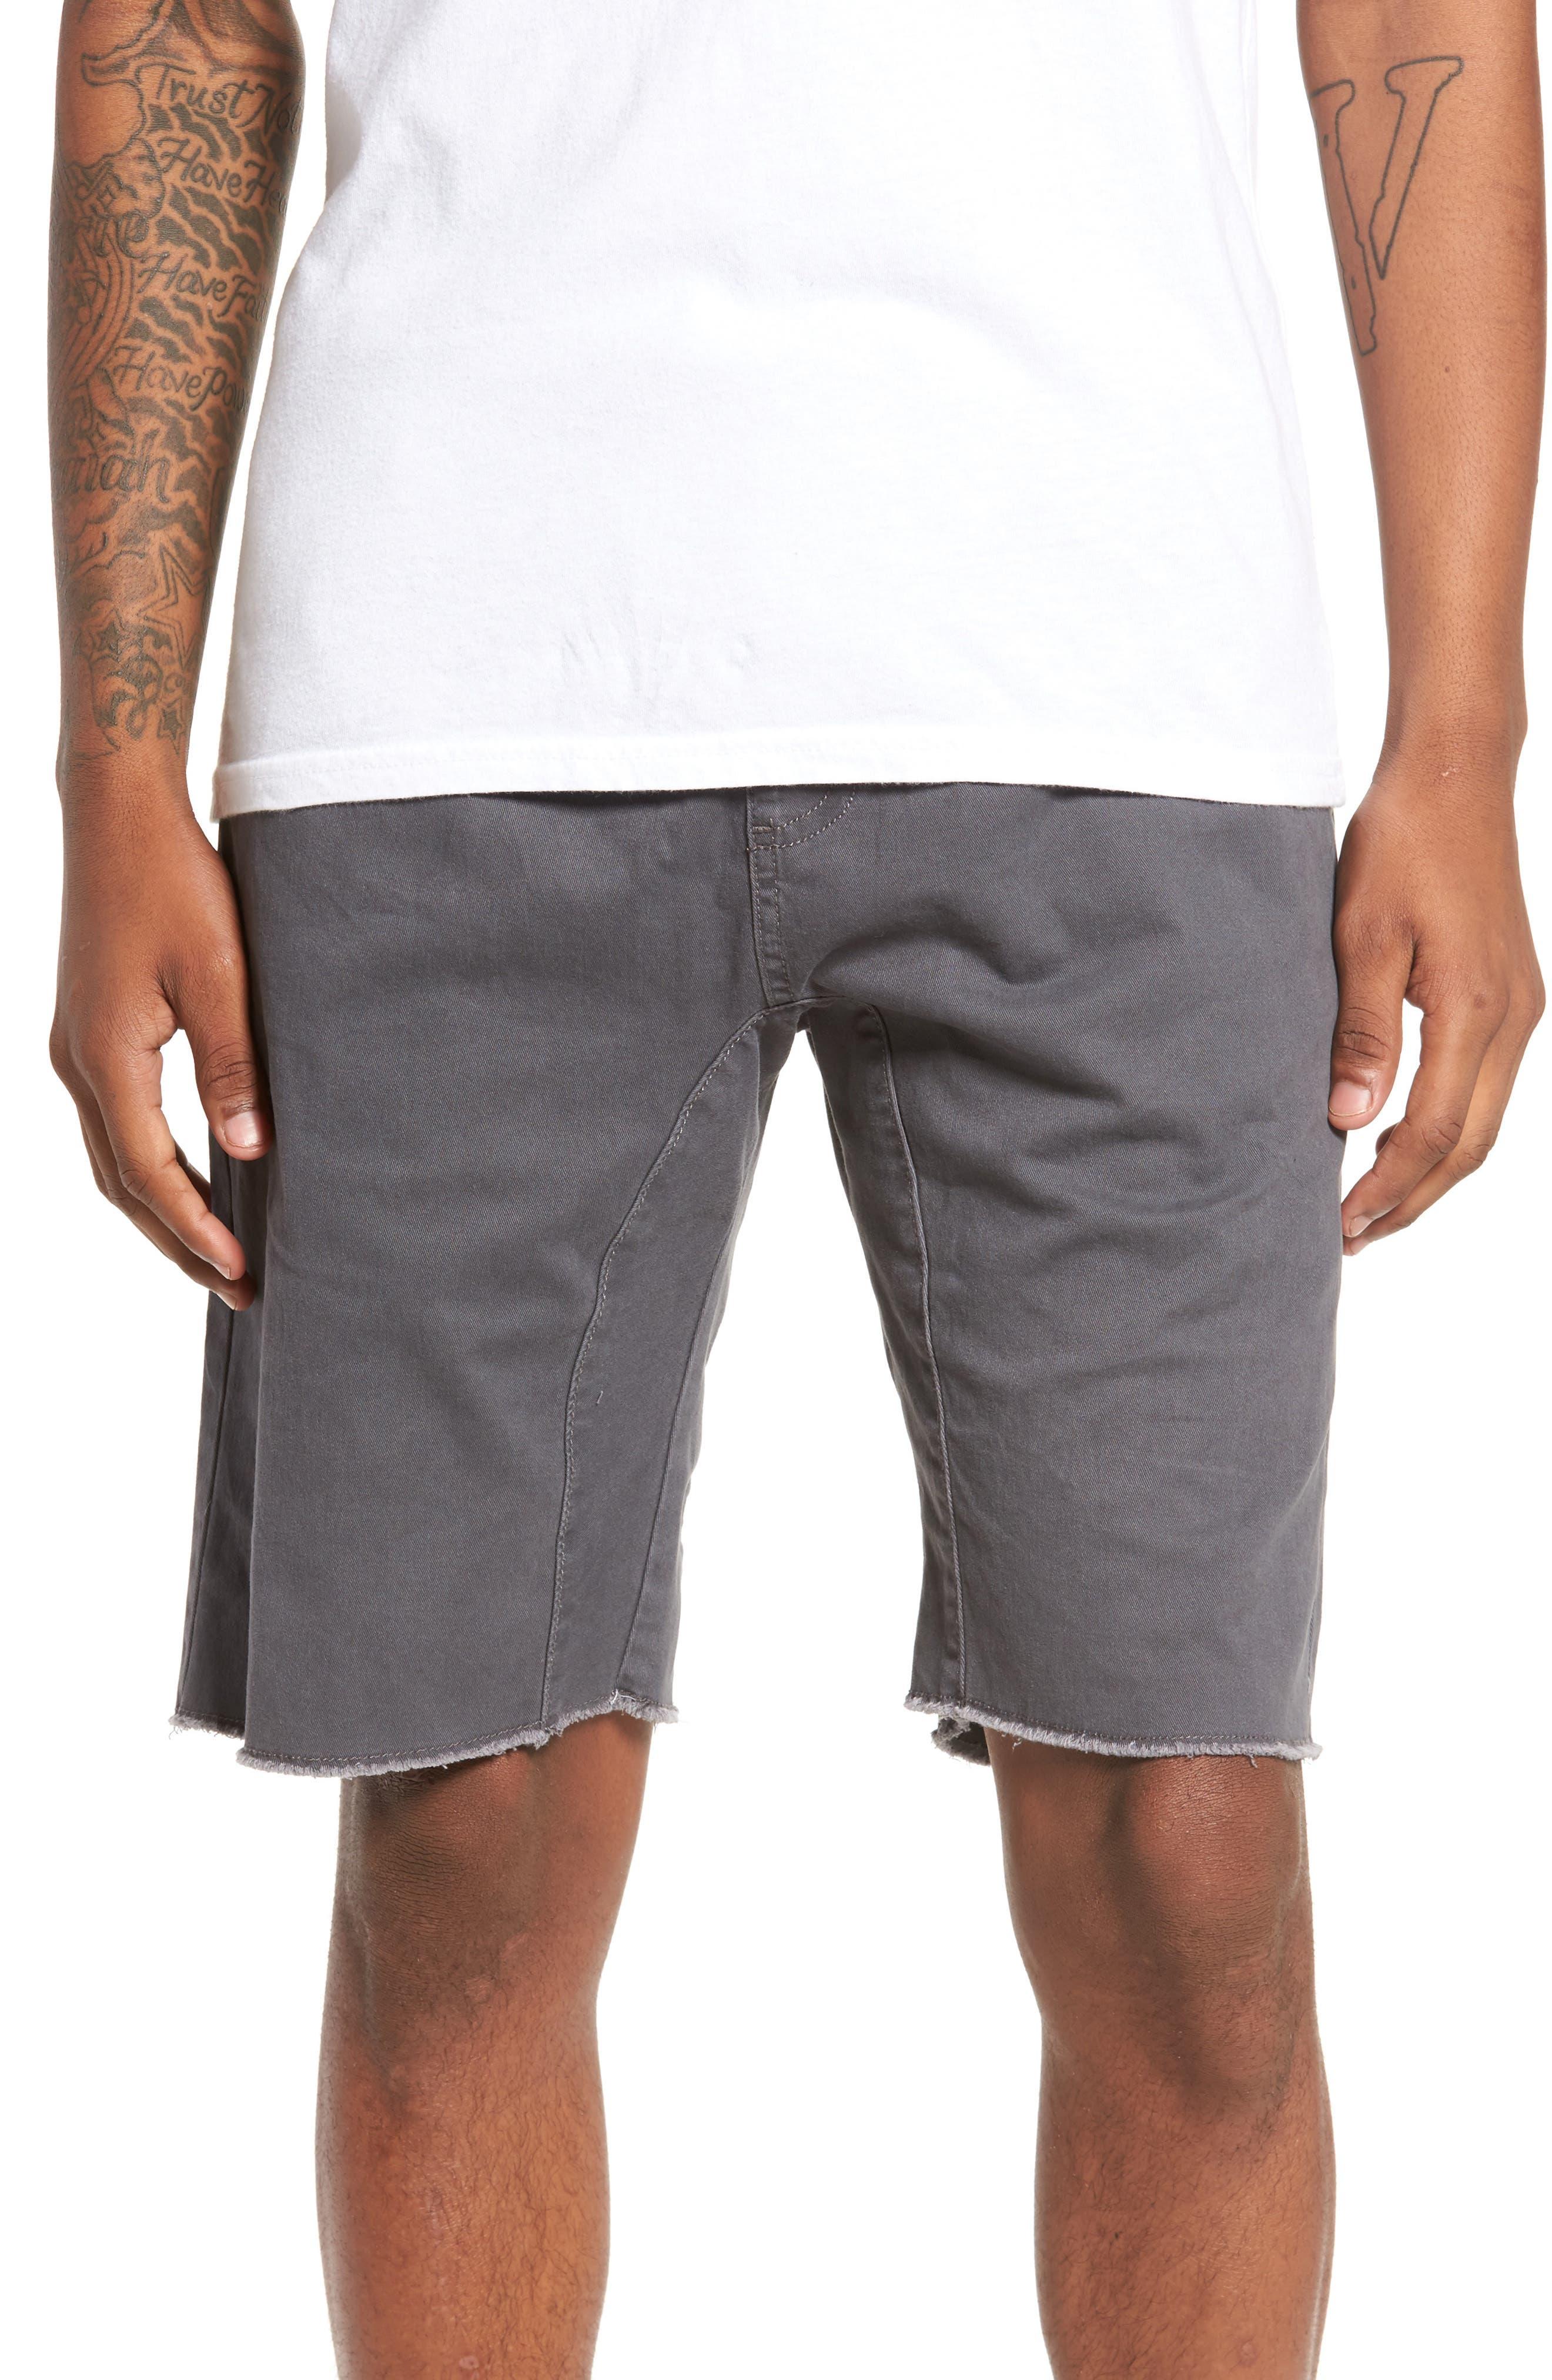 THE RAIL Jogger Shorts, Main, color, GREY ONYX